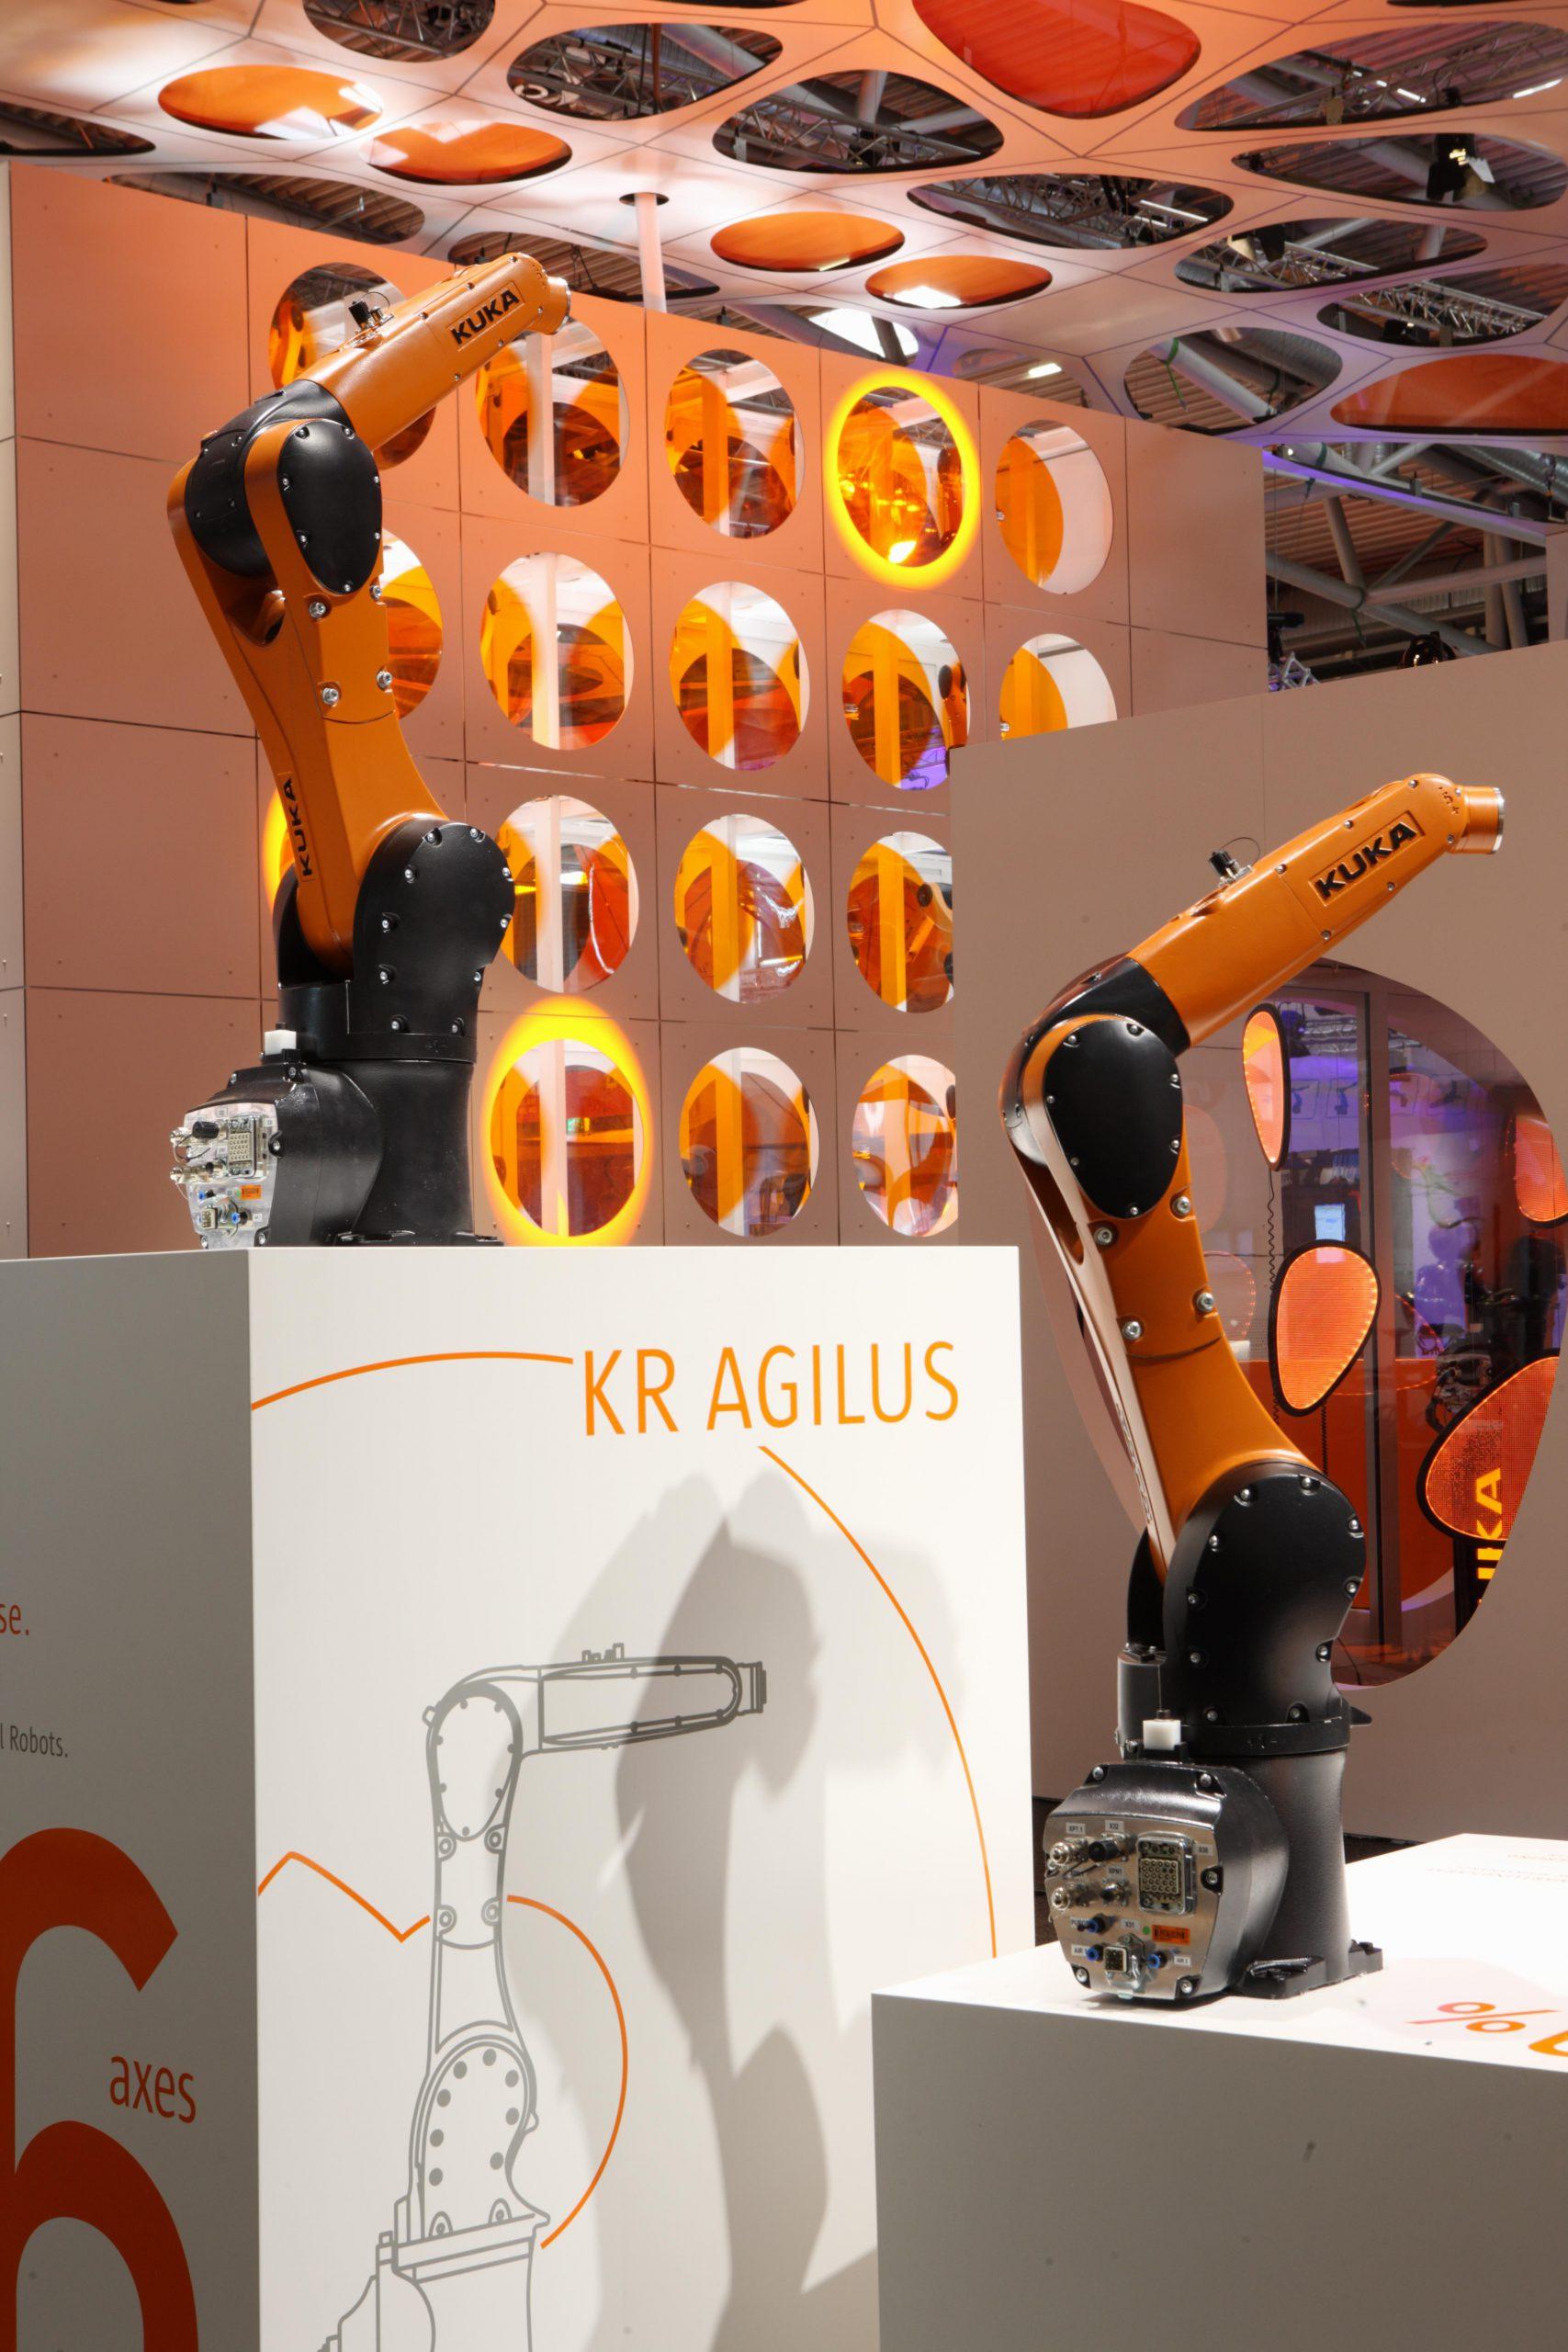 KUKA KR 6 R900 sixx (KR AGILUS)-5